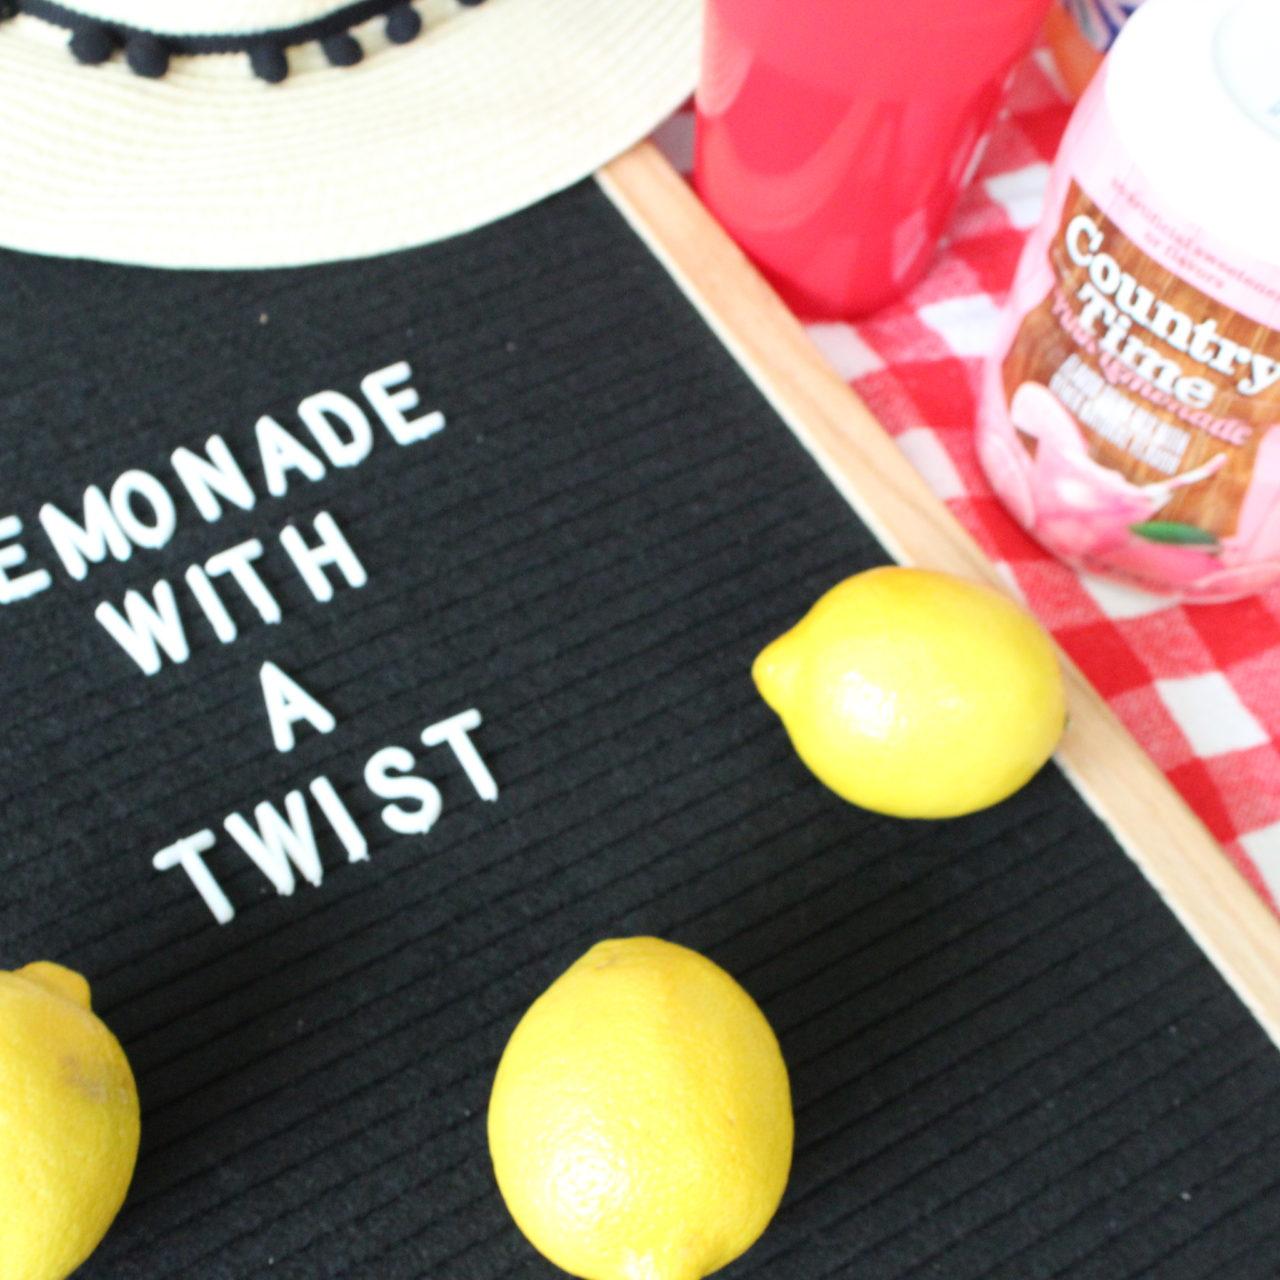 Summer Lemonade with a Twist